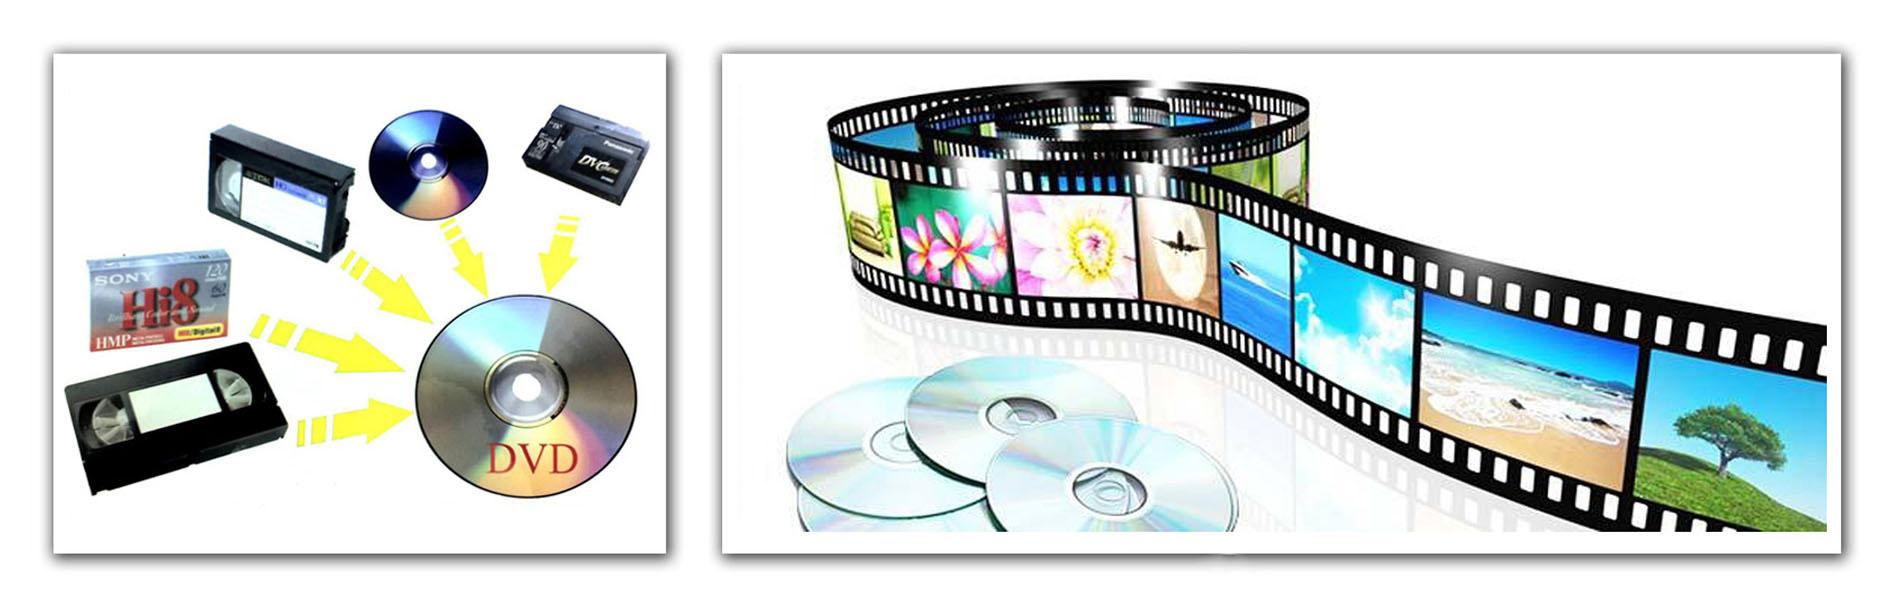 Оцифровка видеокассет в Твери